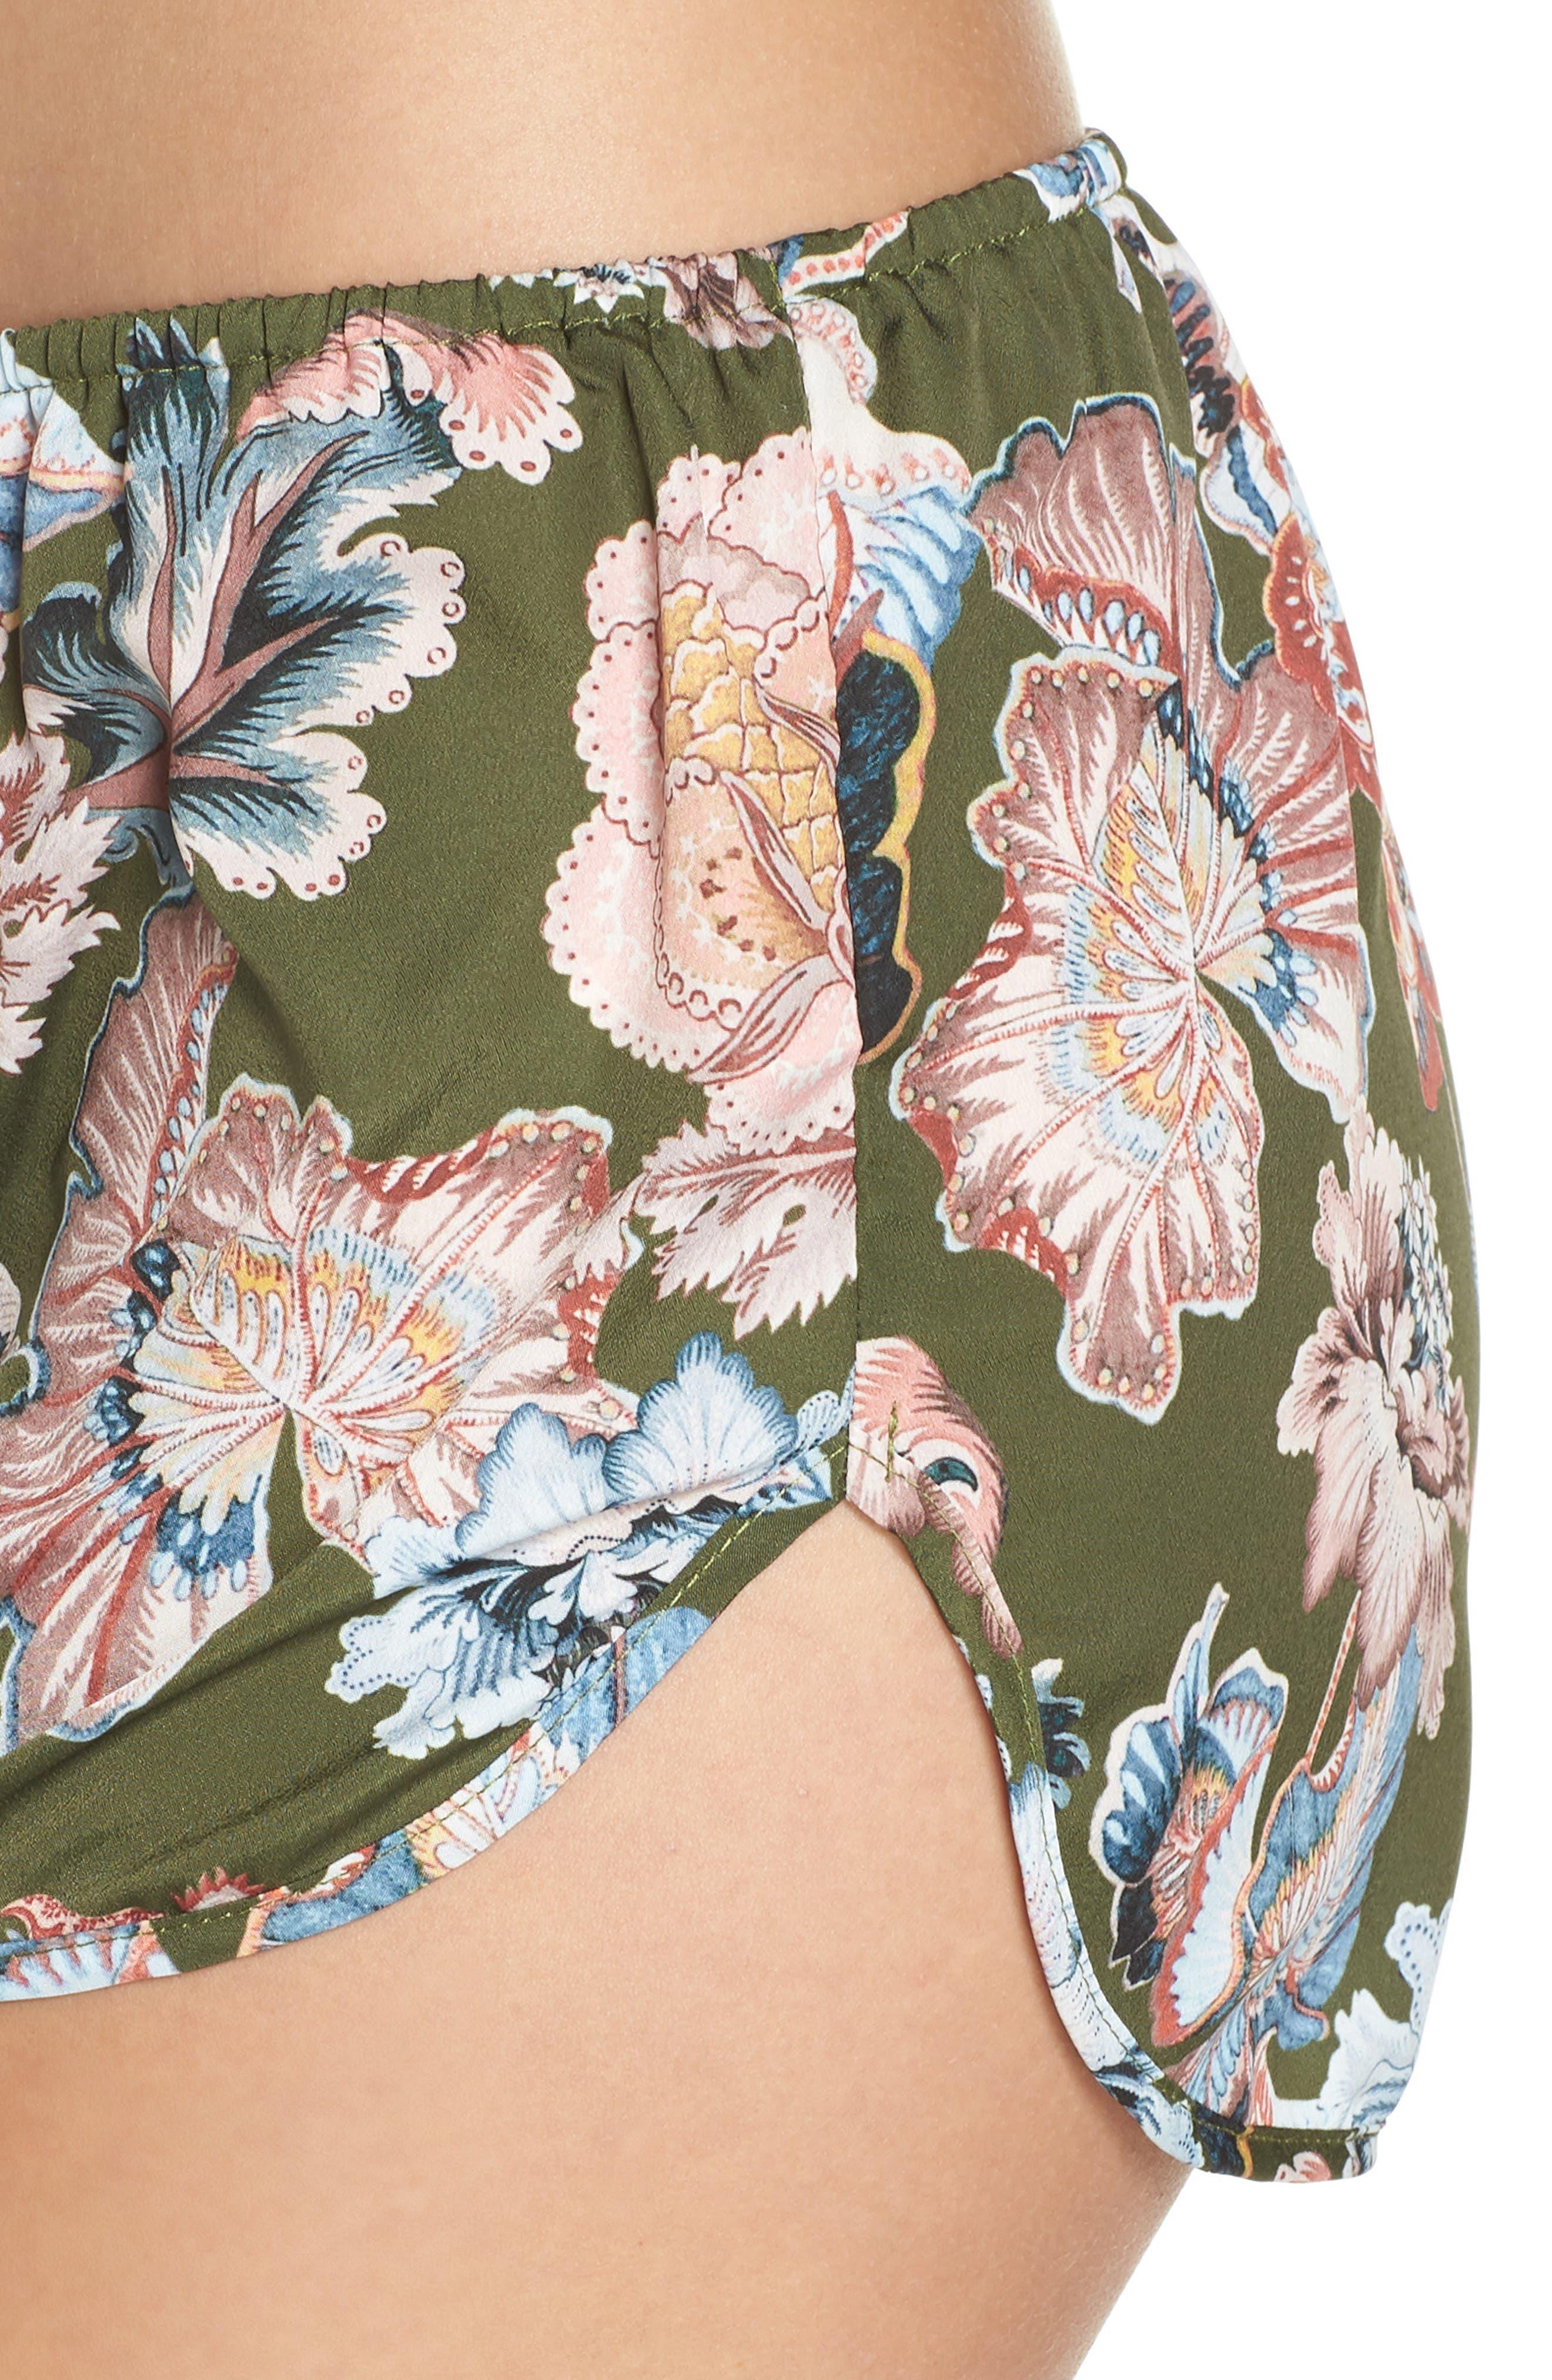 Lola Shorts,                             Alternate thumbnail 4, color,                             OLIVE FLORAL